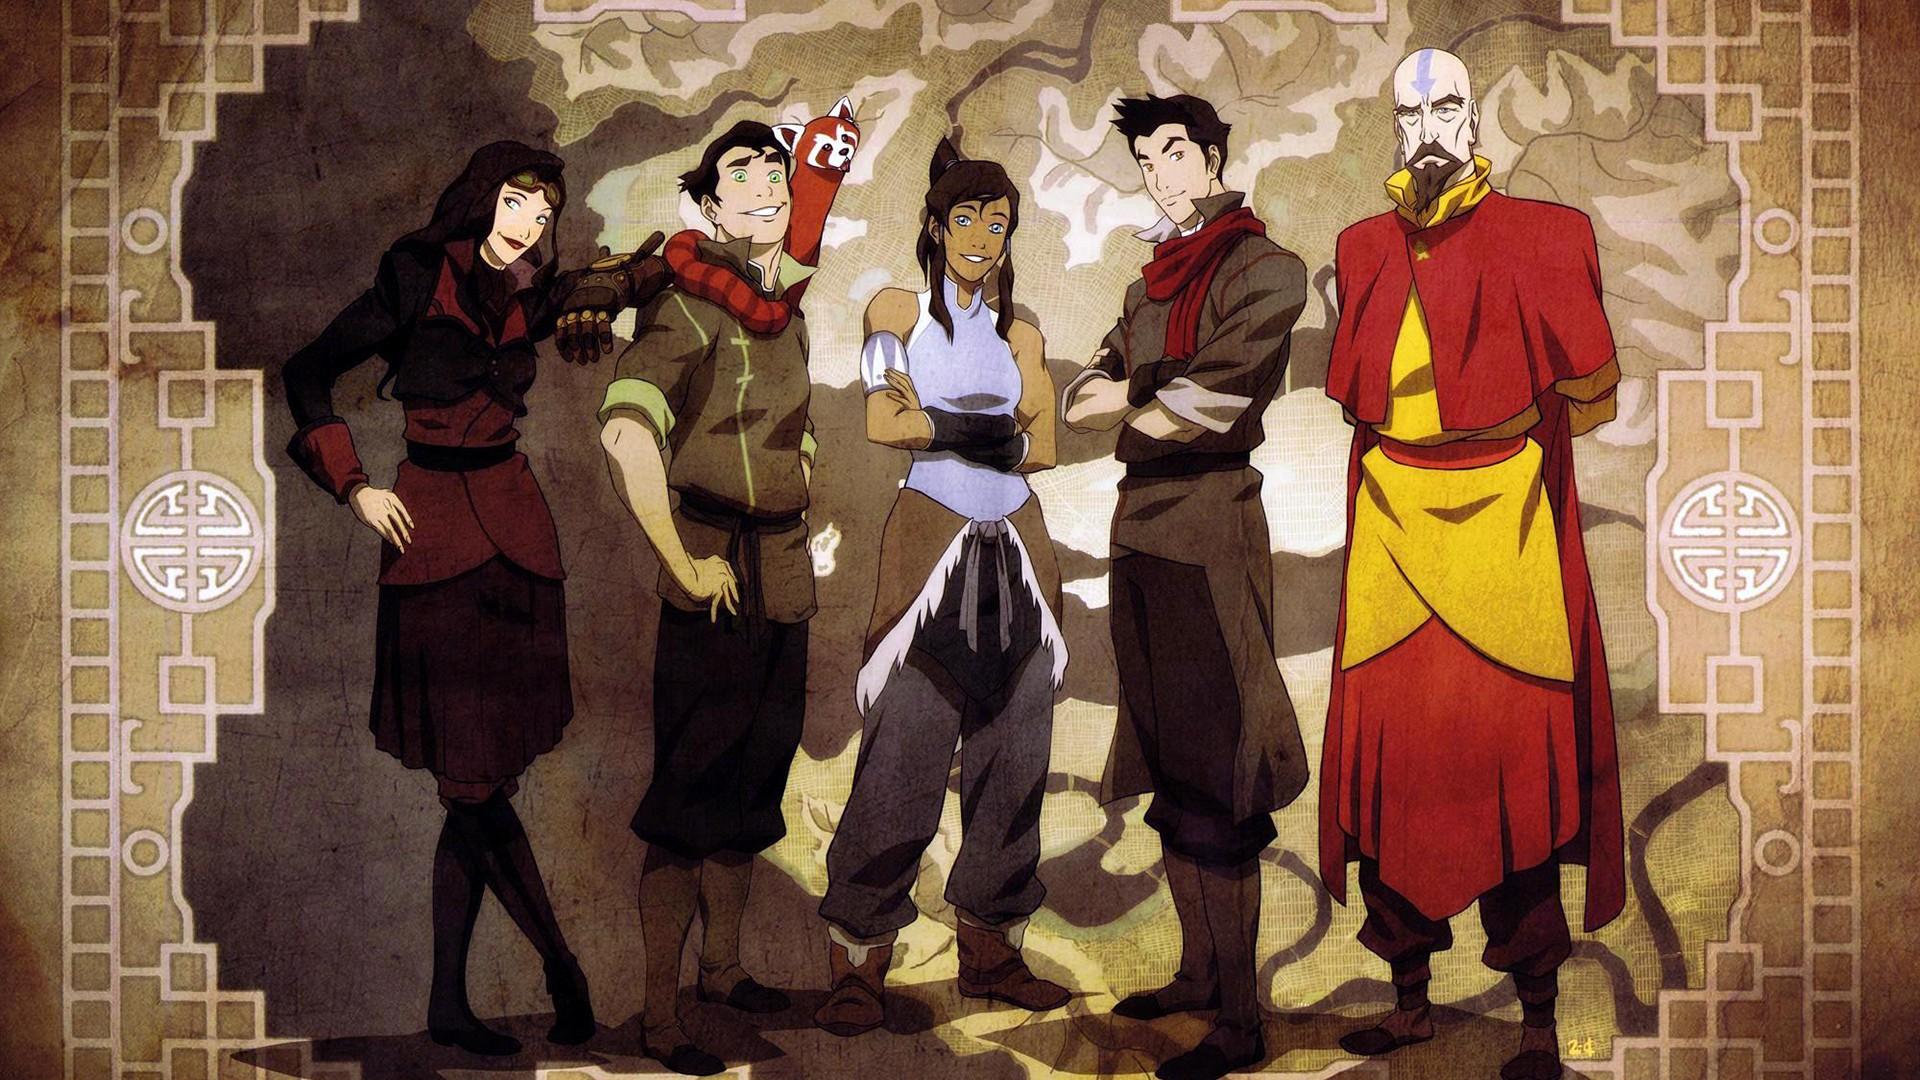 Anime 1920x1080 Avatar: The Last Airbender The Legend of Korra anime boys anime girls anime